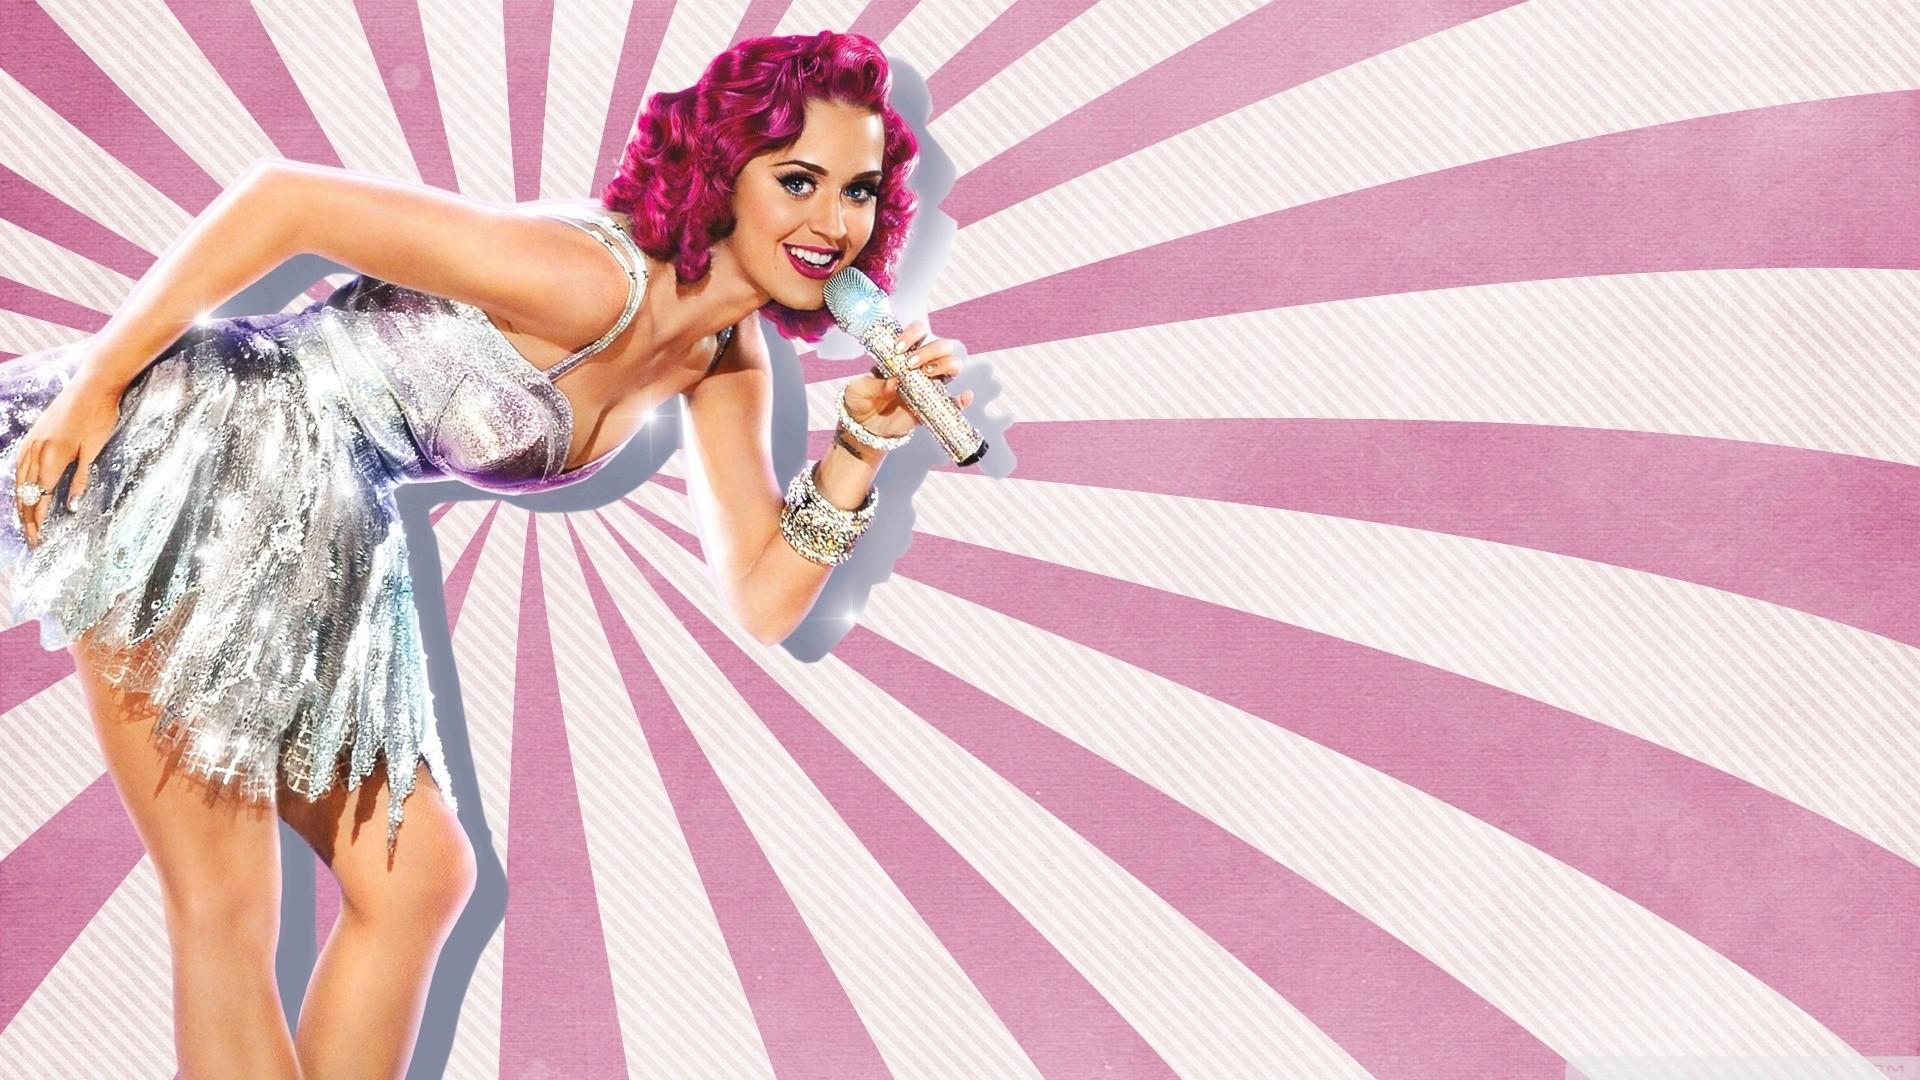 Katy Perry Wallpaper theme